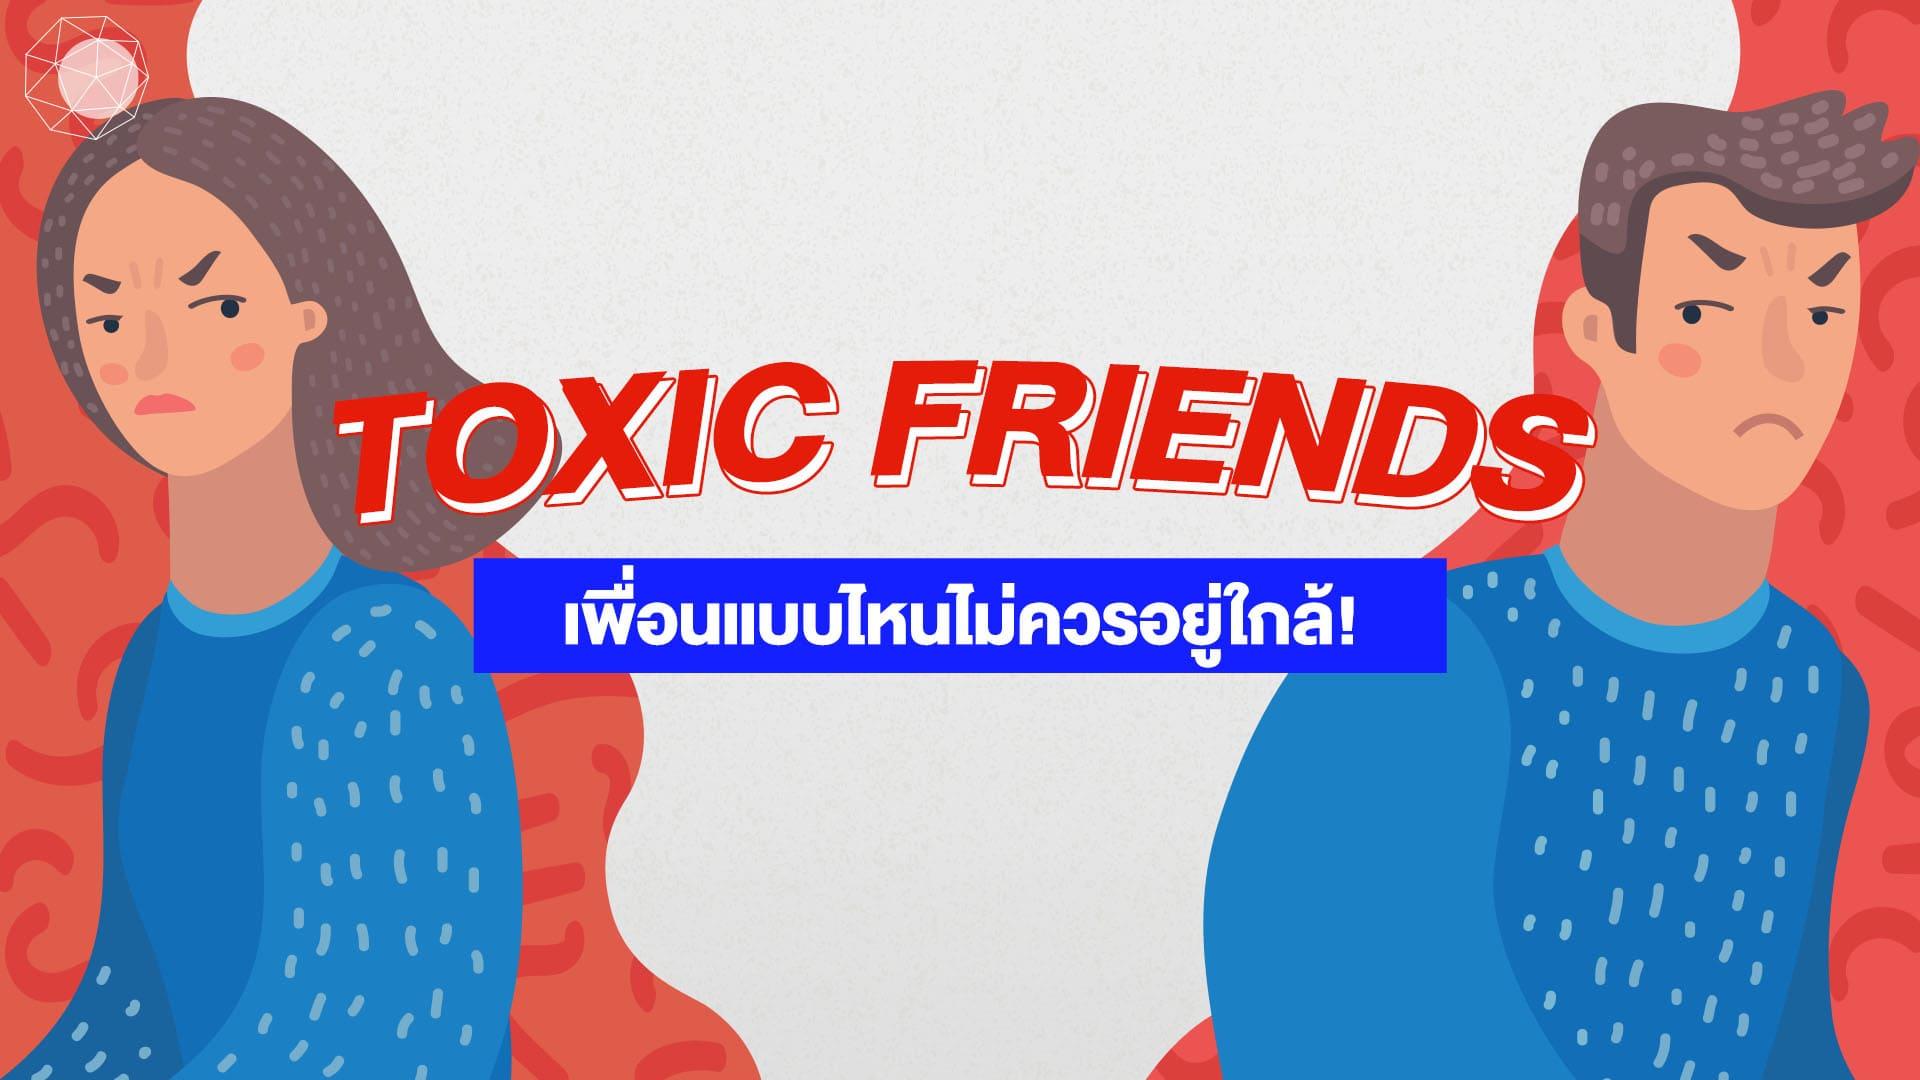 Toxic Friends เพื่อนแบบไหนที่ไม่ควรอยู่ใกล้!